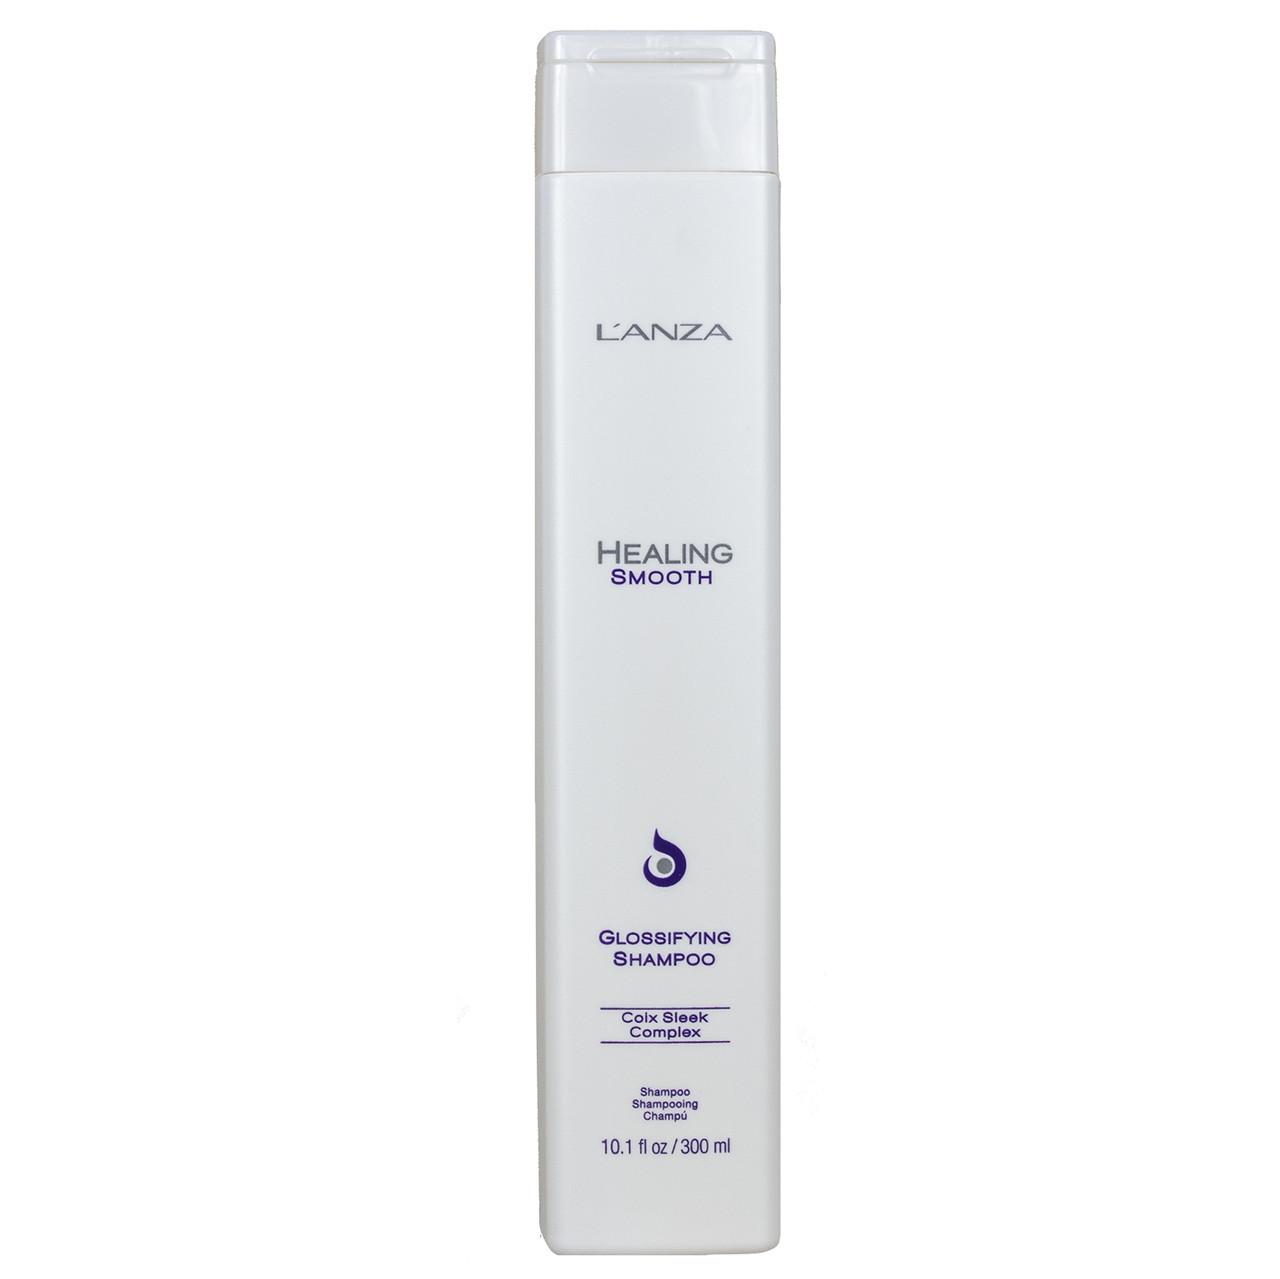 Lanza healing smooth glossifying shampoo Разглаживающий Шампунь для блеска волос ph: 5.4, 300 мл